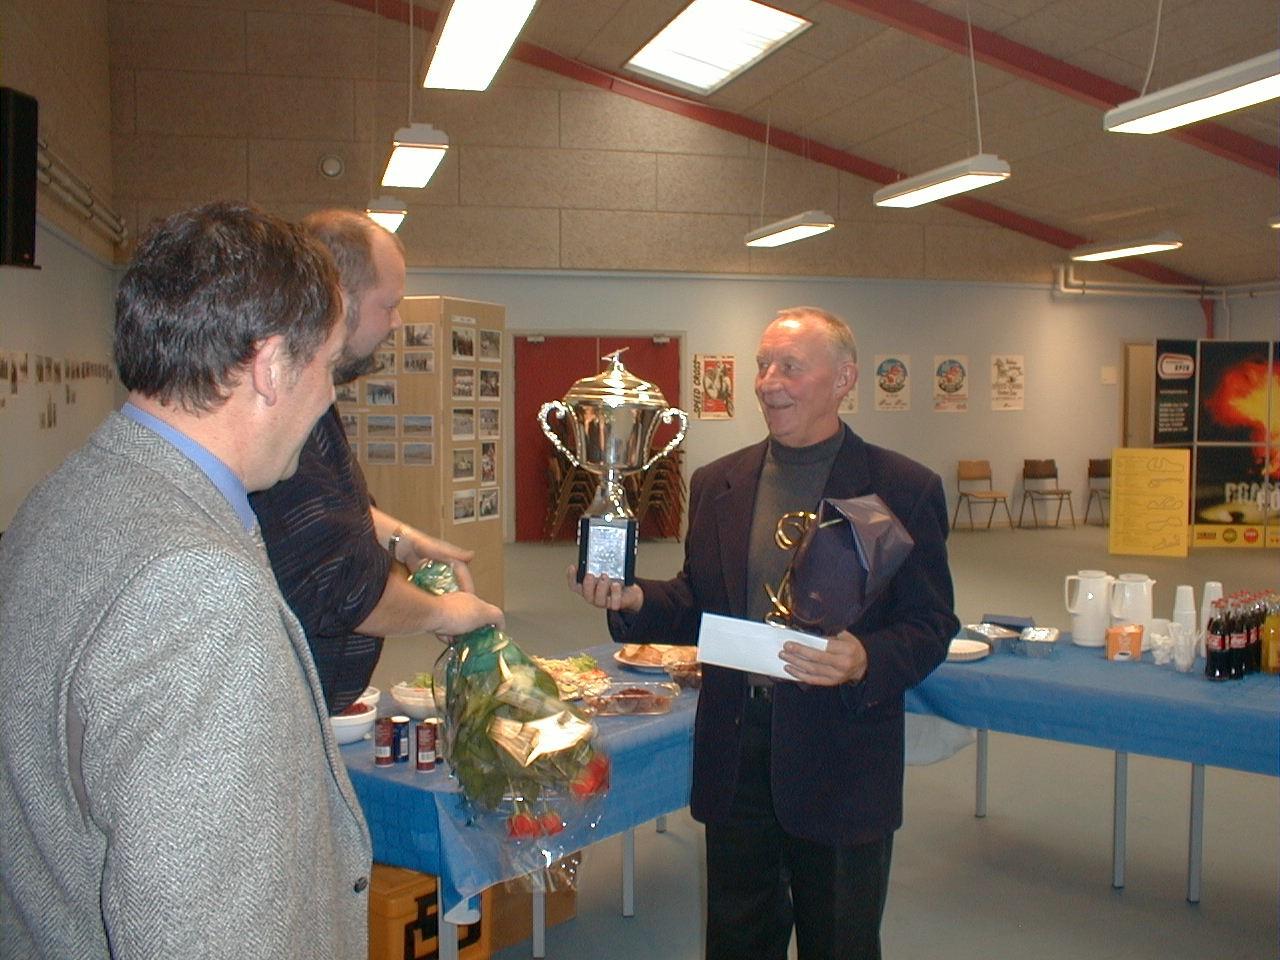 Bent Andersen, Pauli Rasmussen og Jimmy Smed med Jubilæumspokalen.